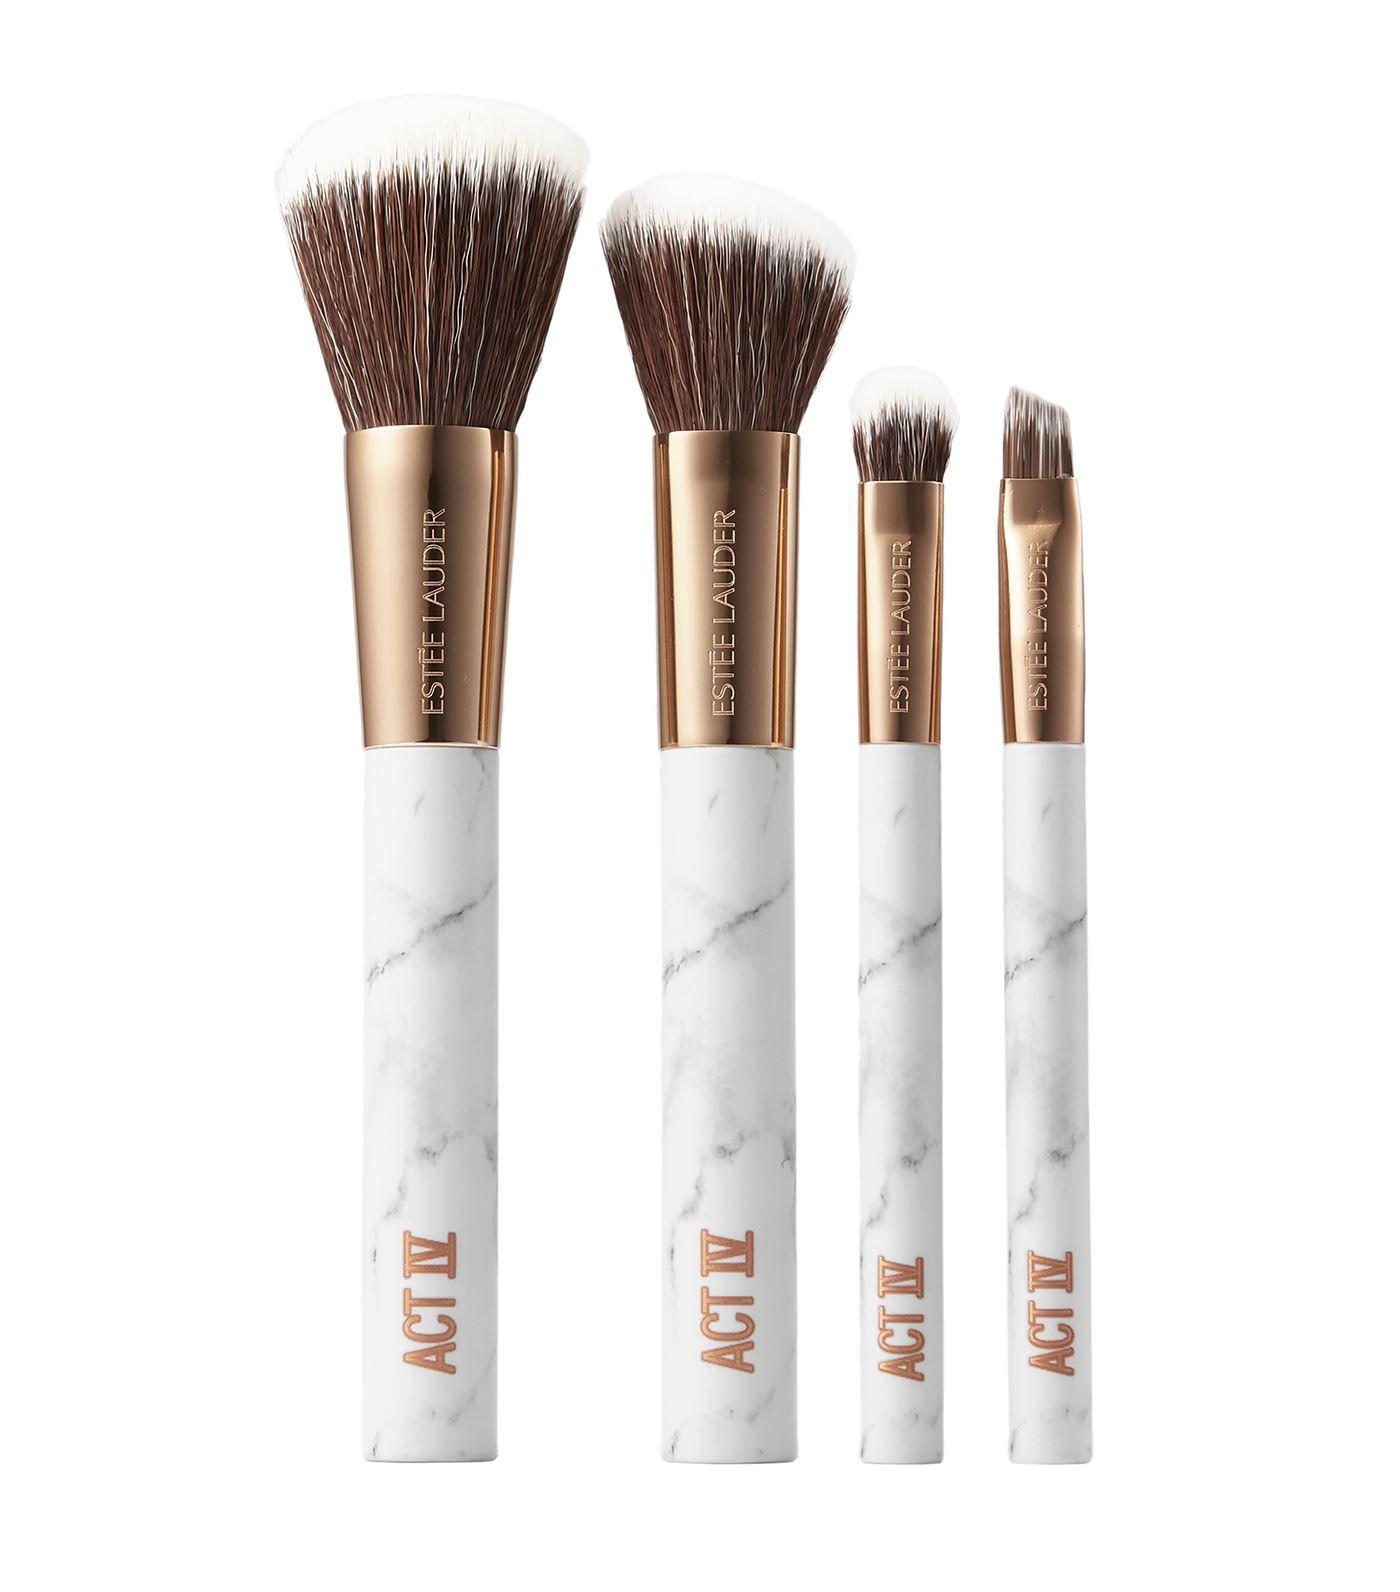 Act IV Brushed by Fame Makeup Brush Kit in 2020 Makeup